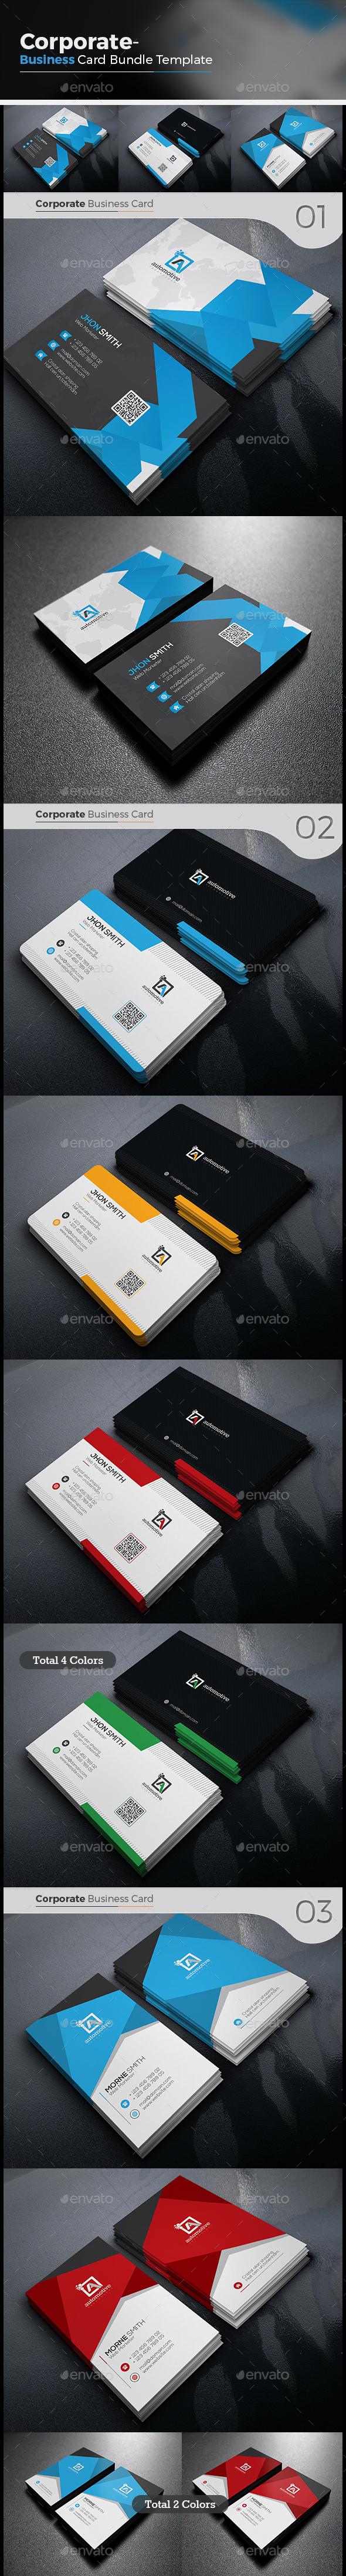 Corporate Business Card Bundle 3 in 1 - Corporate Business Cards